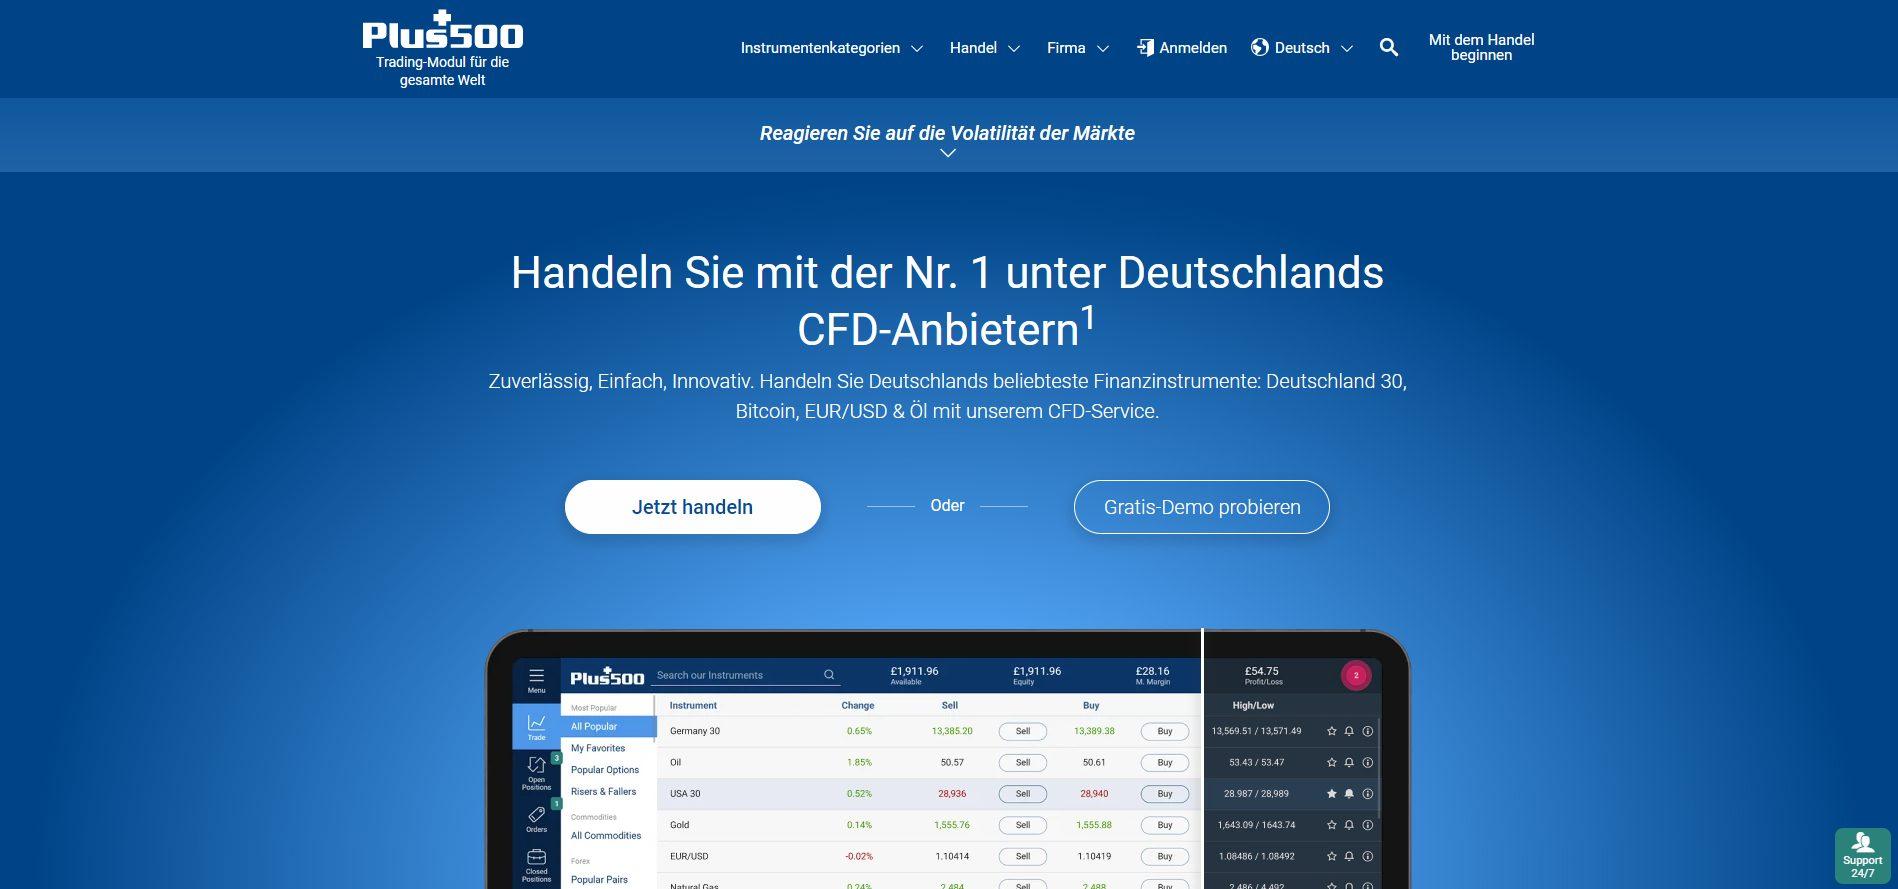 Plus500 CFD Broker Webseite